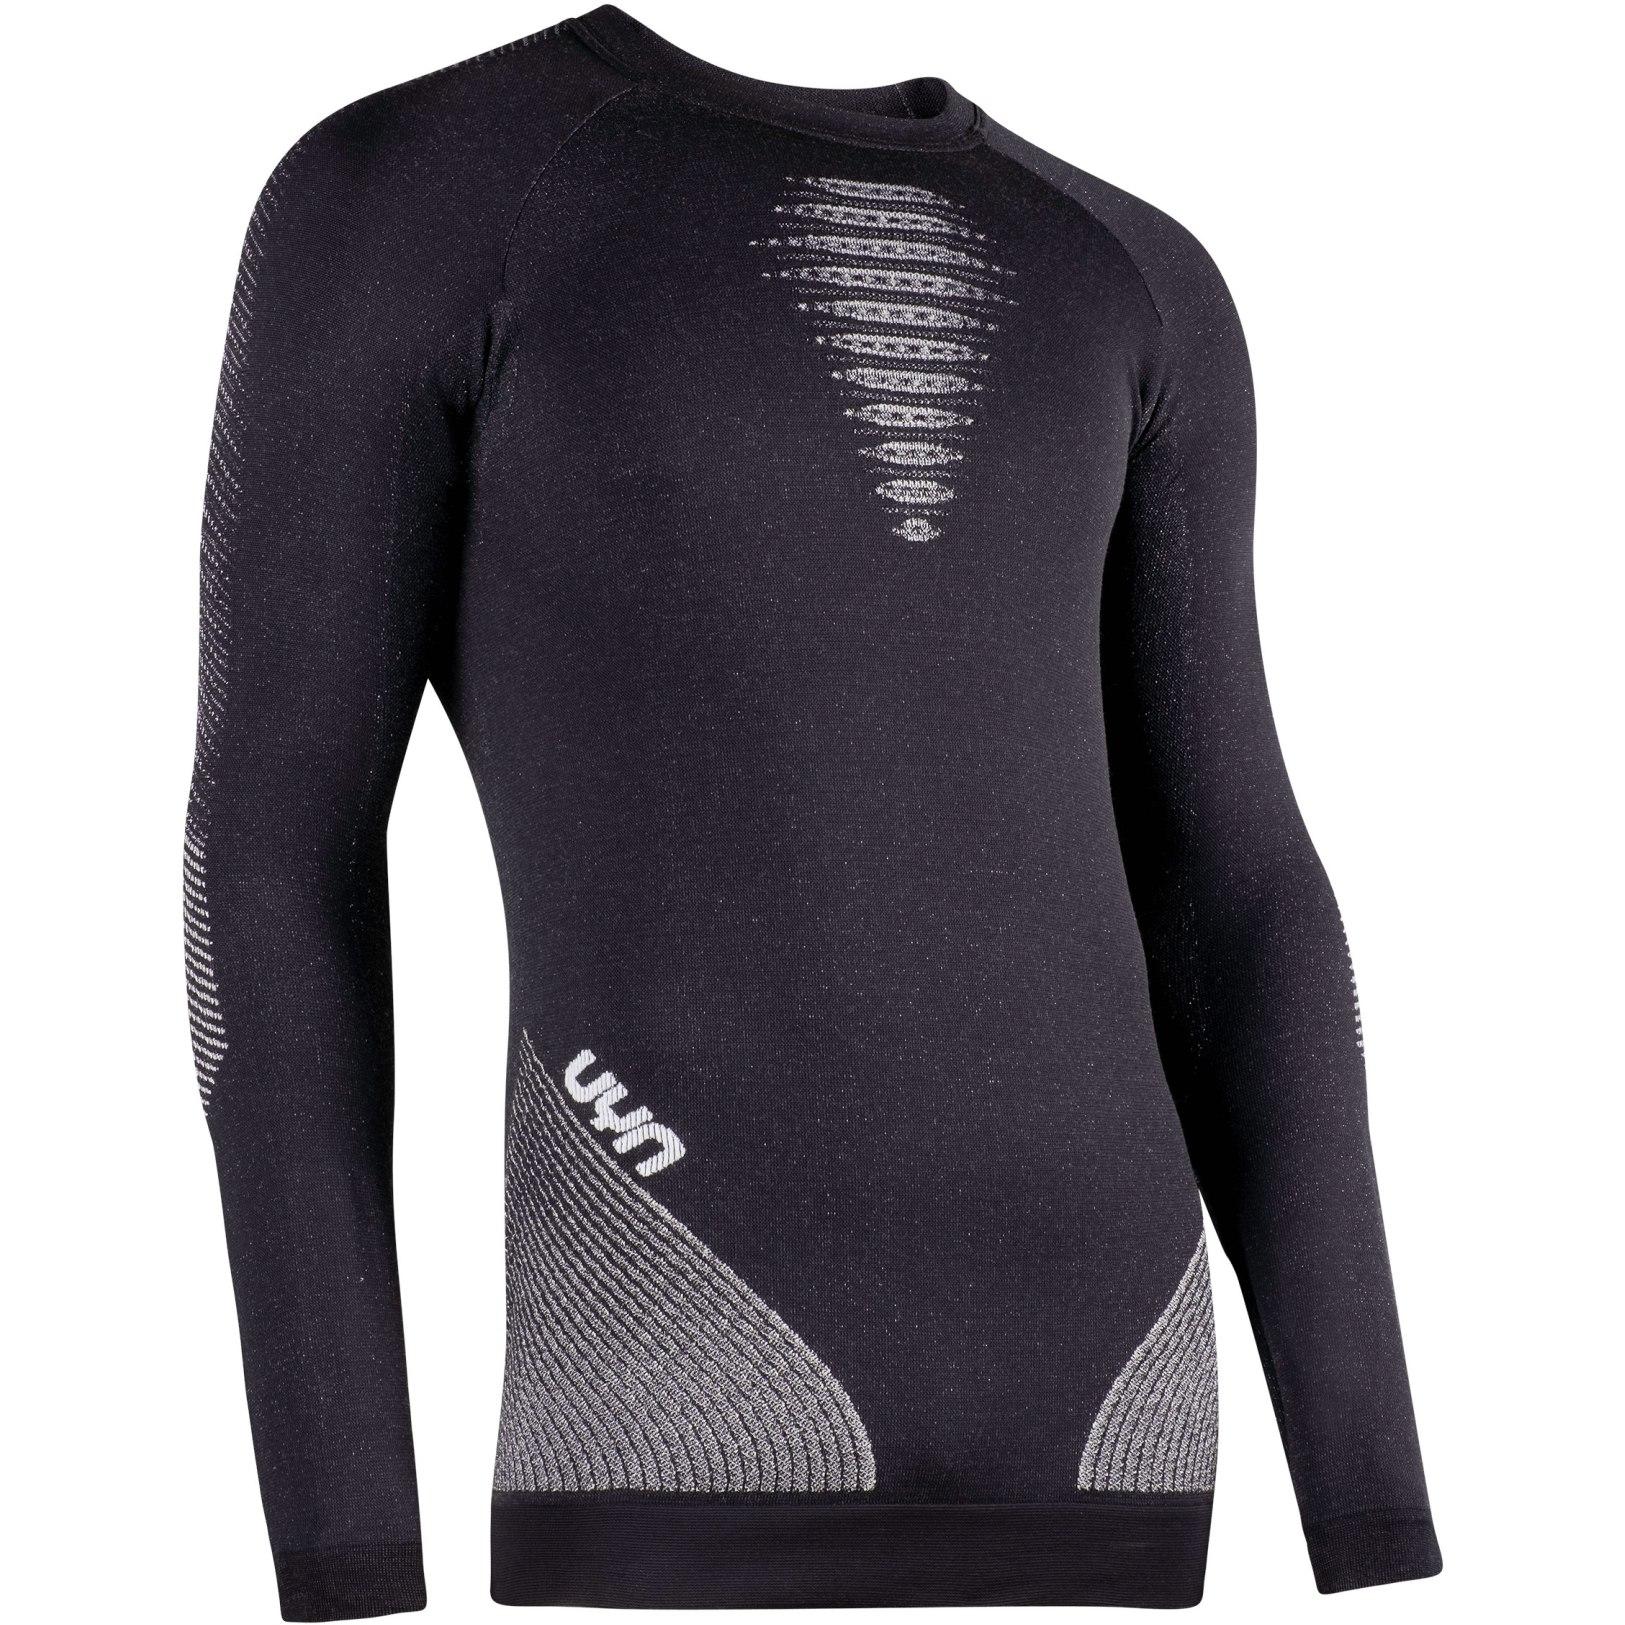 Image of UYN Cashmere Shiny 2.0 Underwear Longsleeve Shirt - Celebrity Silver